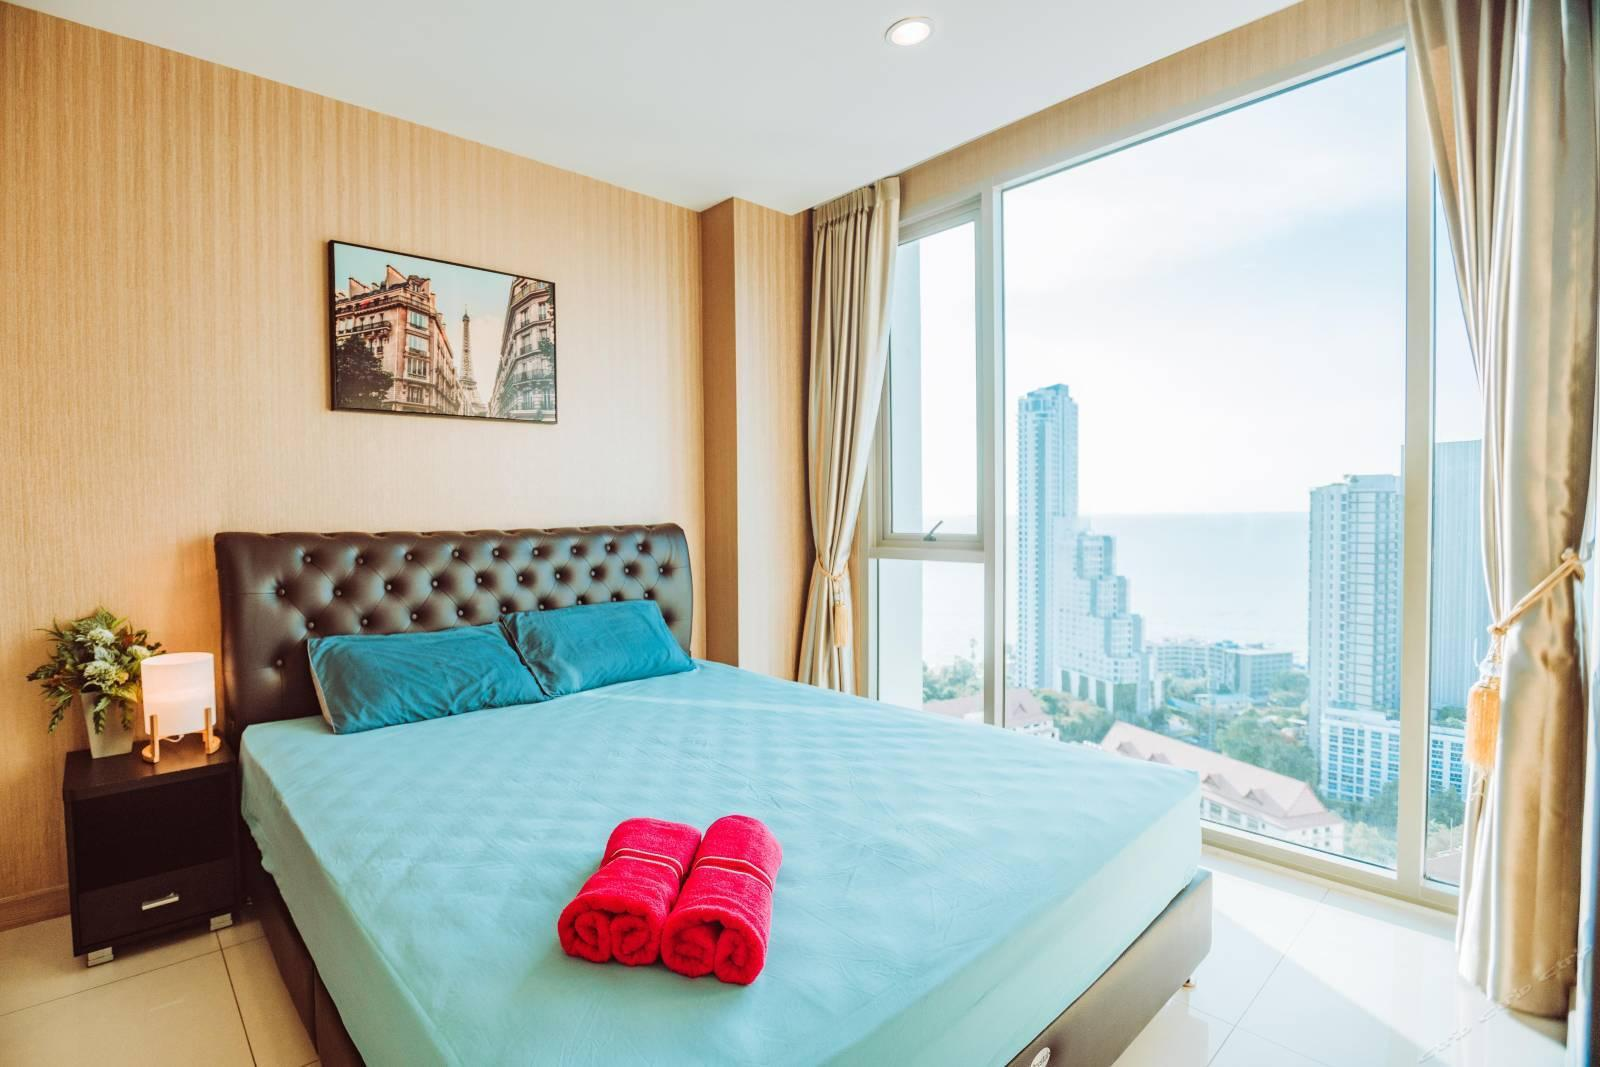 Rivera ocean view apartment hotel อพาร์ตเมนต์ 1 ห้องนอน 1 ห้องน้ำส่วนตัว ขนาด 41 ตร.ม. – หาดวงอมาตย์